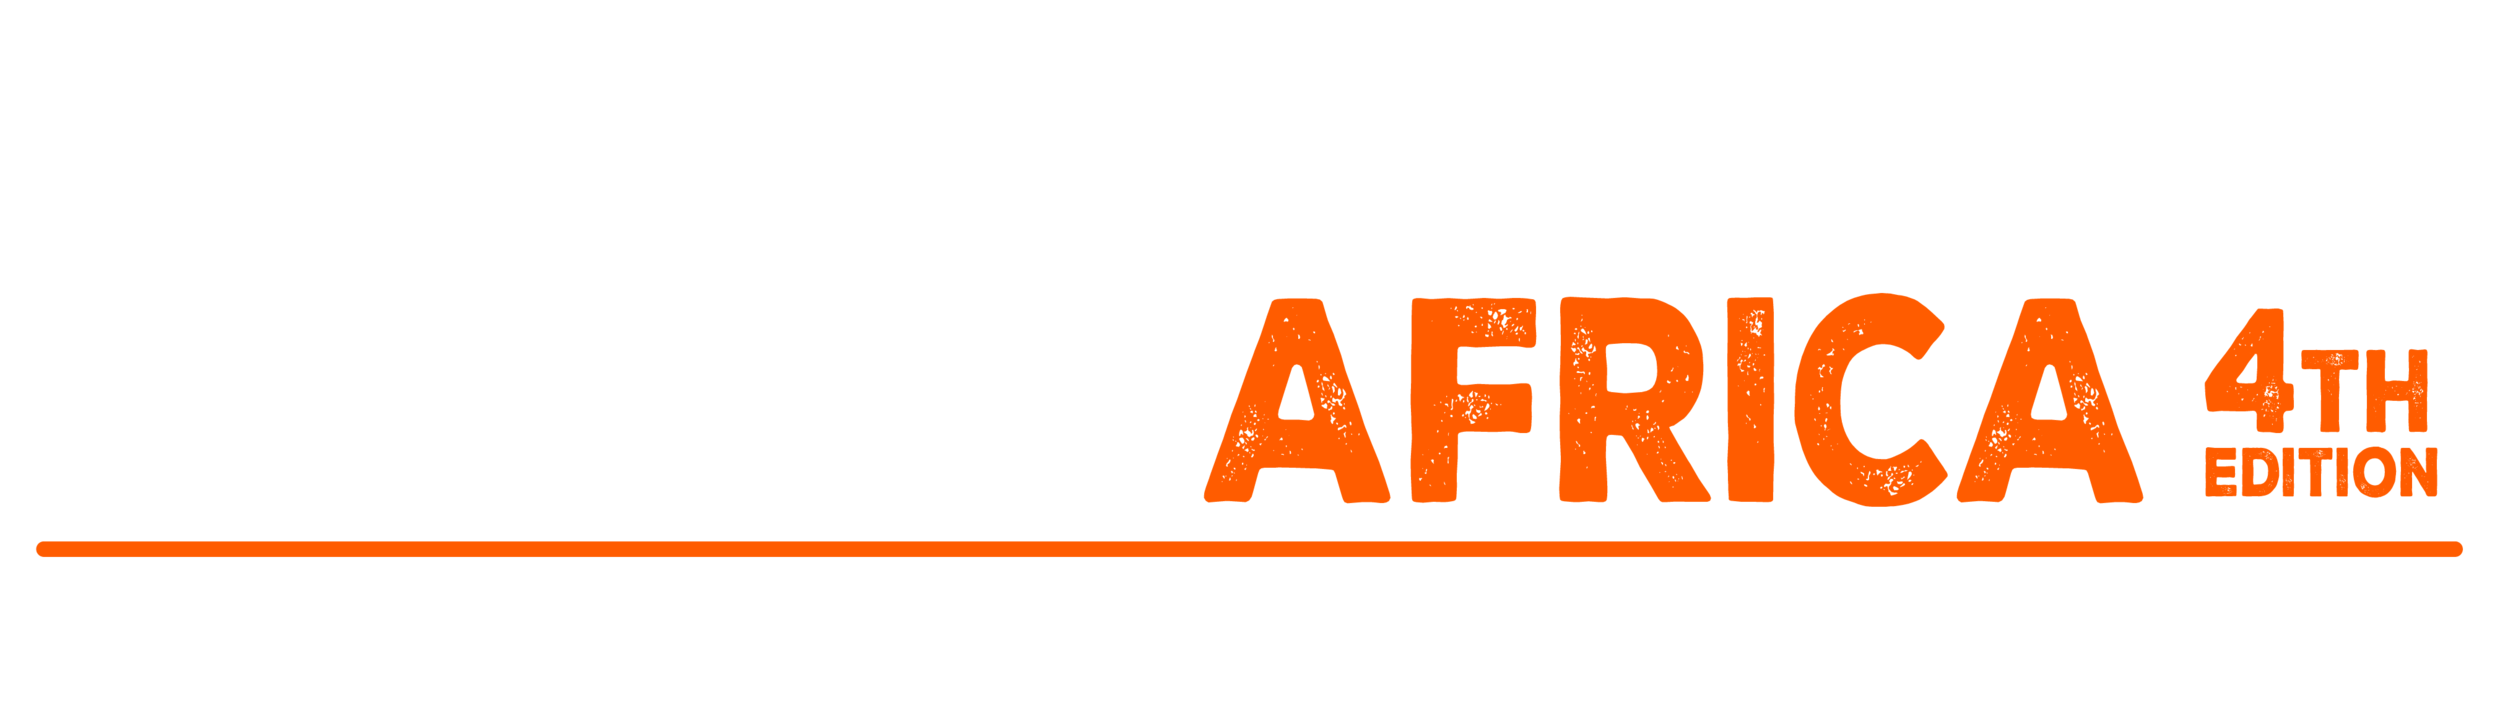 USC Africa 2019 Logo (white & orange)-01.png